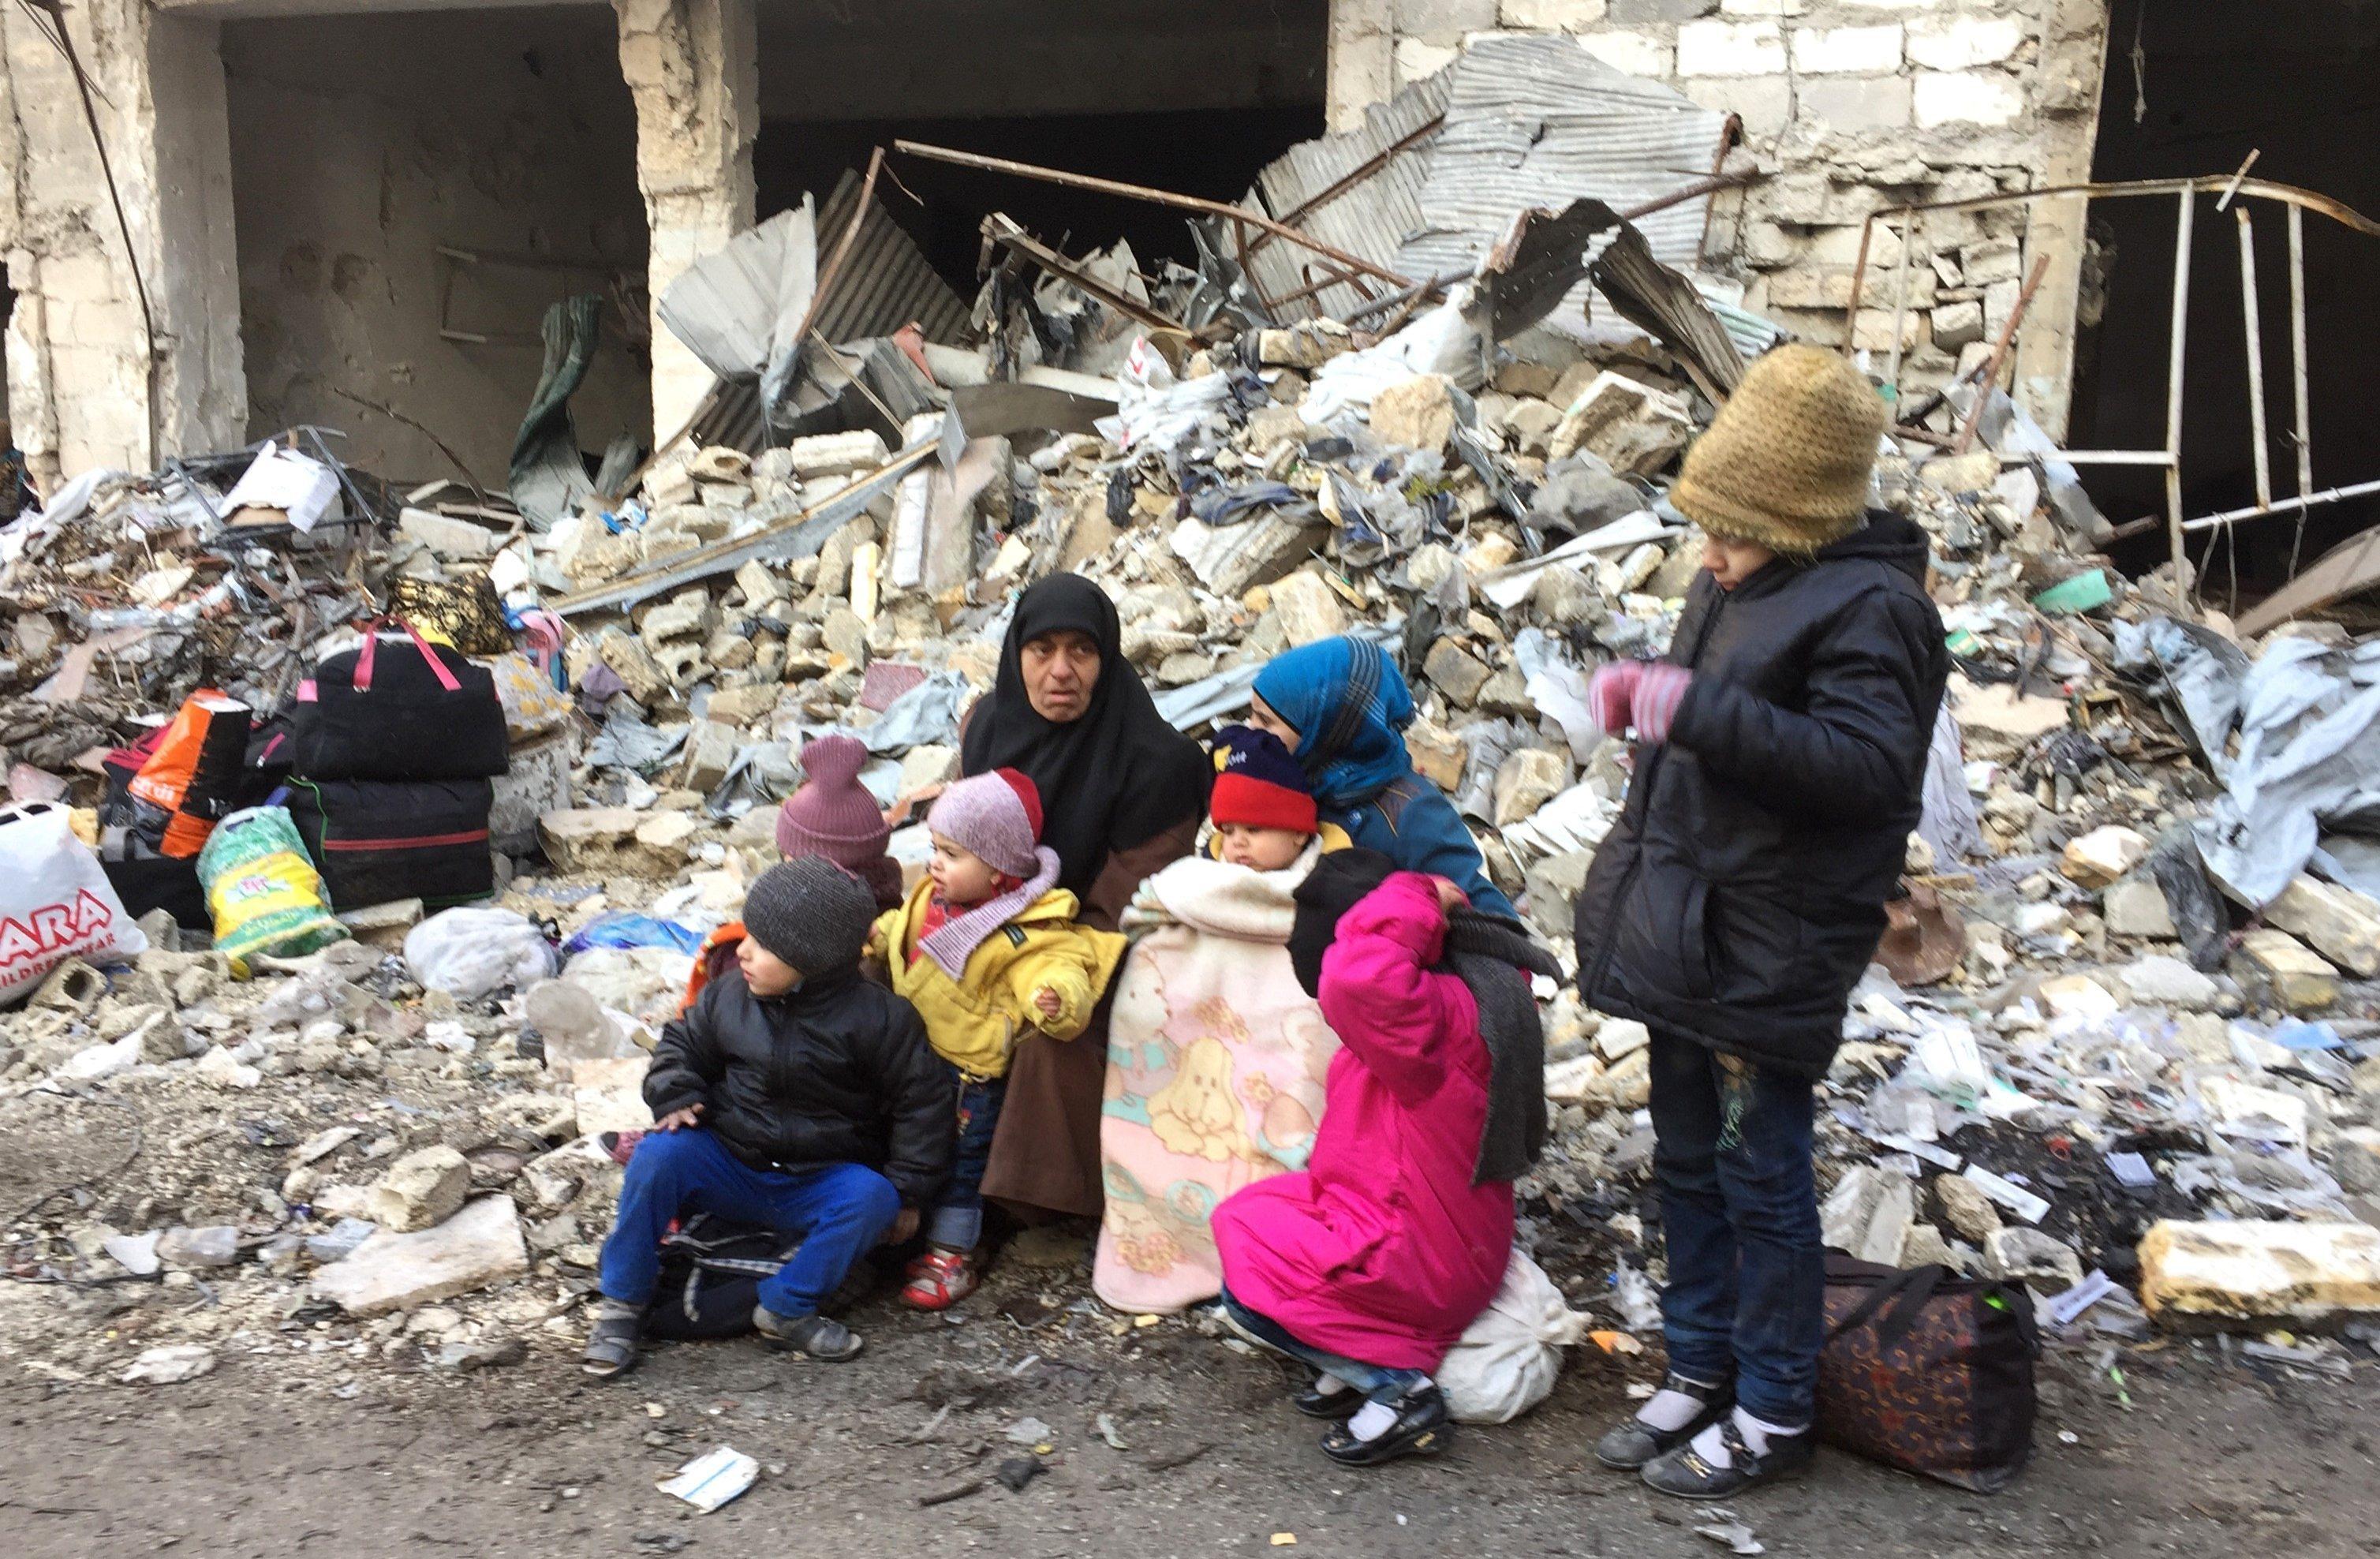 Civilians wait to be evacuated from Aleppo (Mamun Ebu Omer/Anadolu Agency/Getty Images)